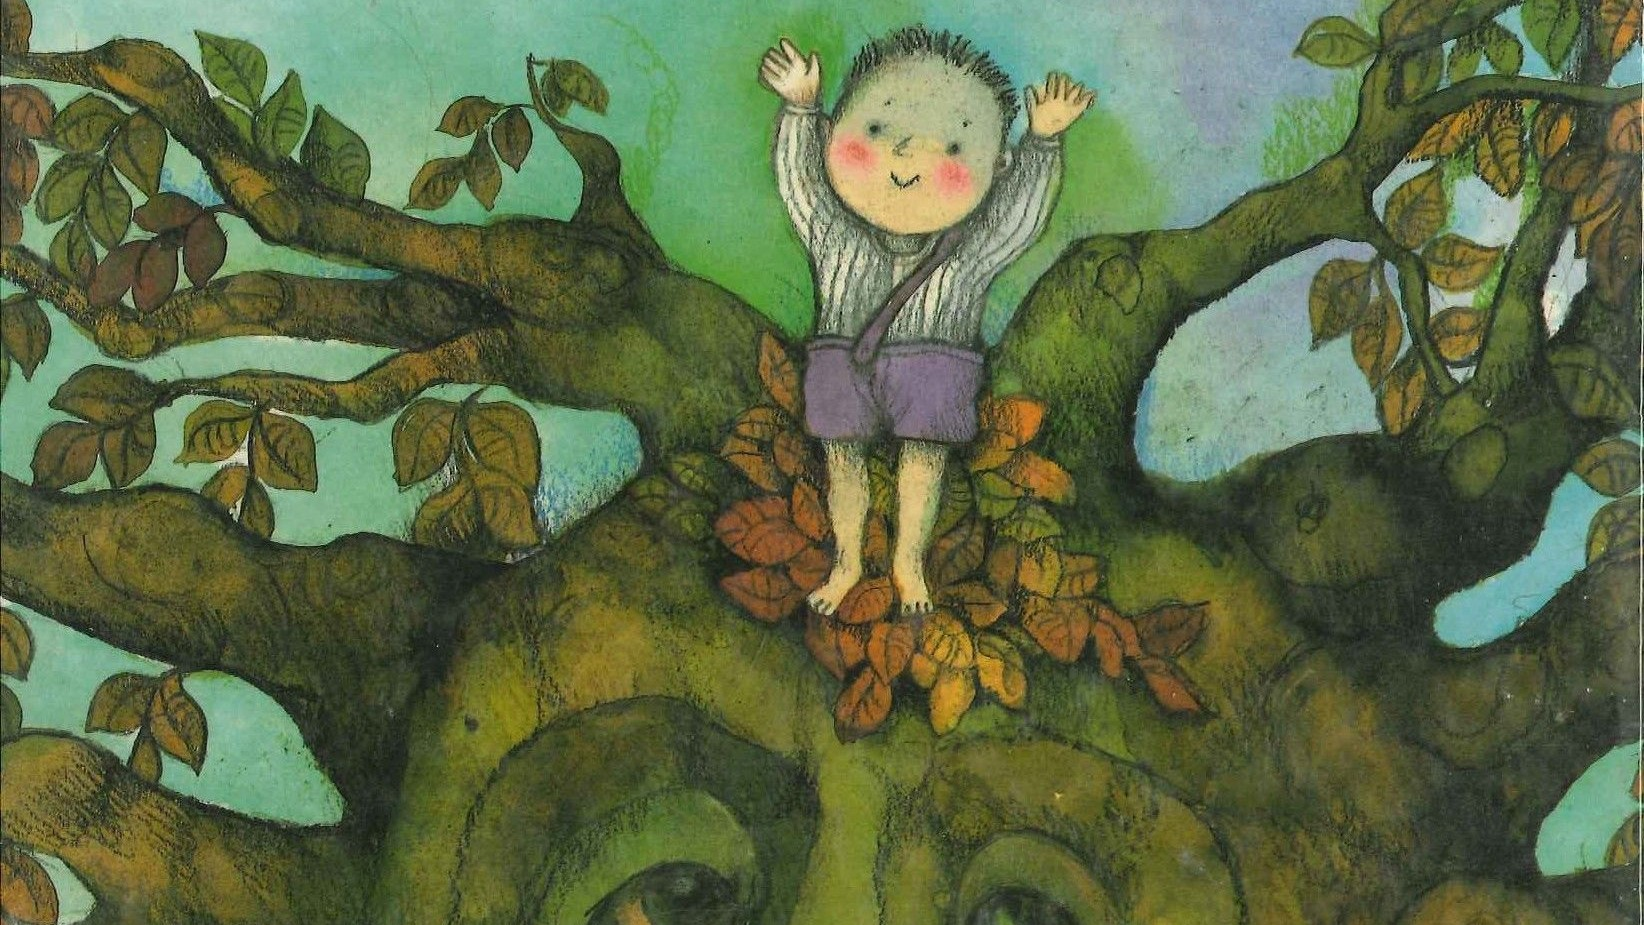 Viví Escrivá, Premio Nacional de Ilustración 2021